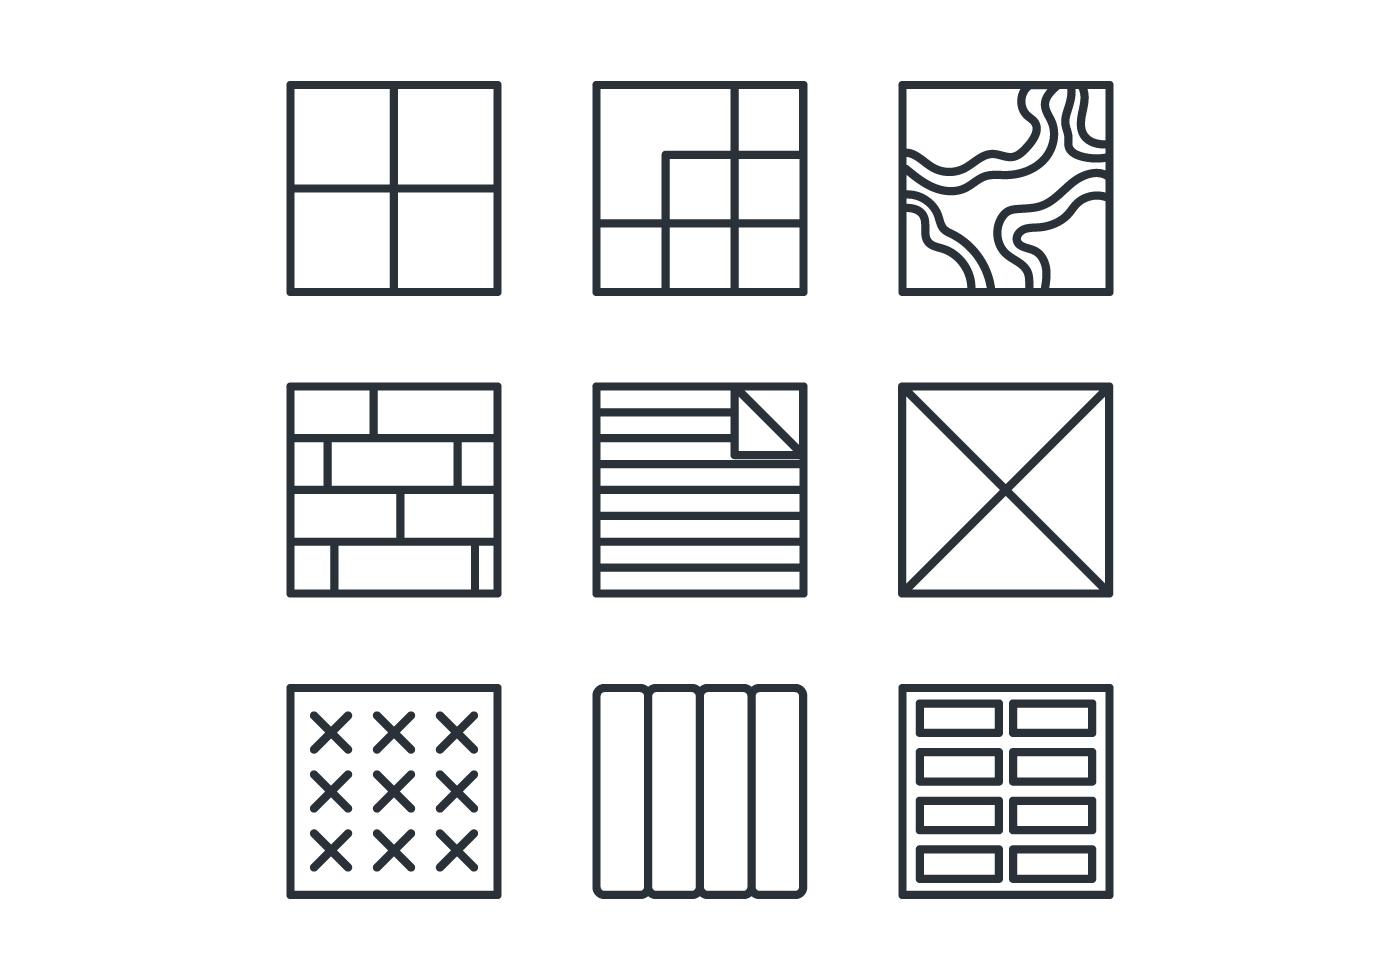 Patterned Floors